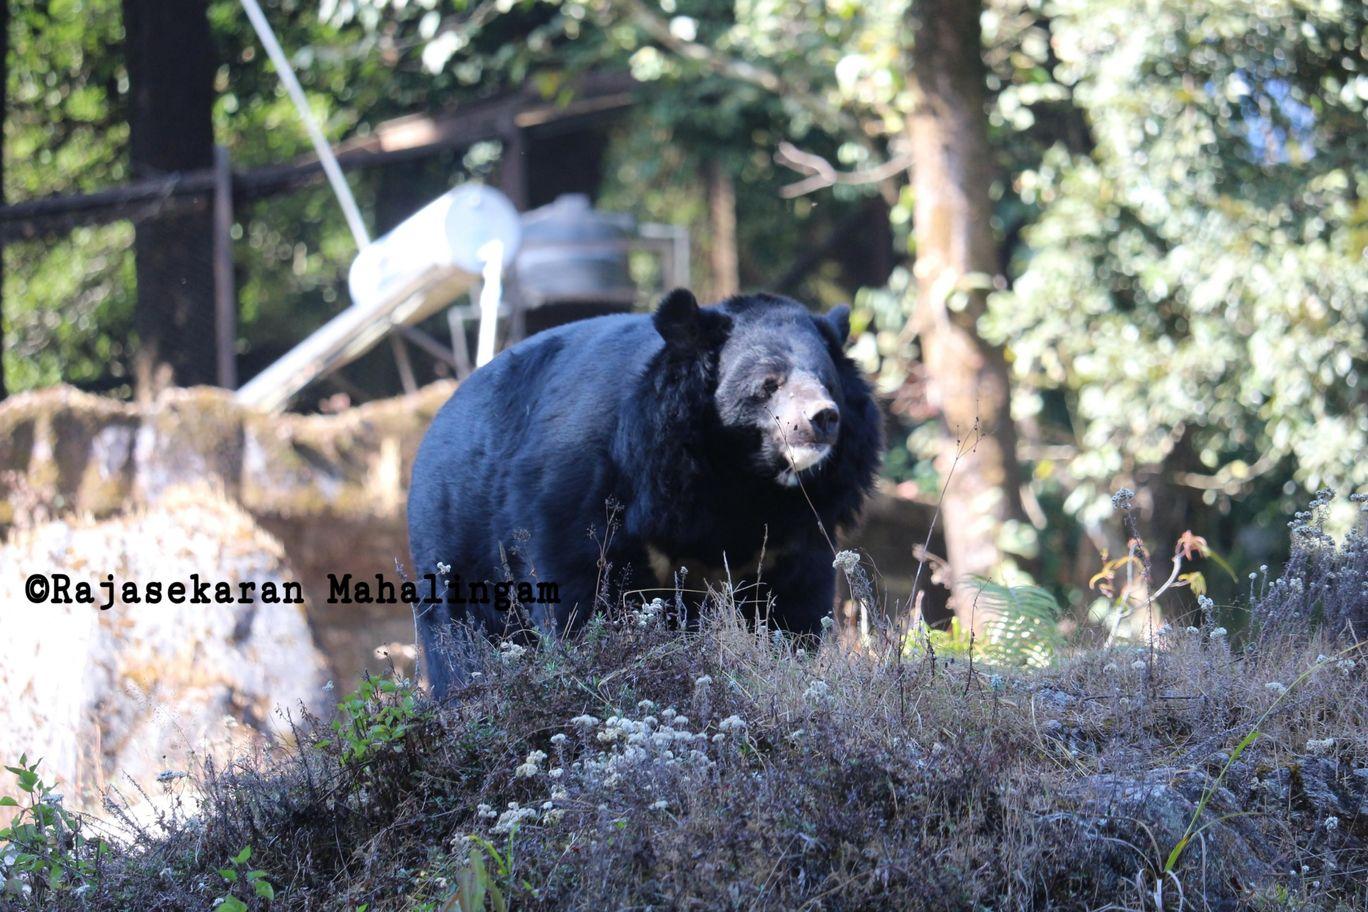 Photo of Darjeeling By Rajasekaran Mahalingam